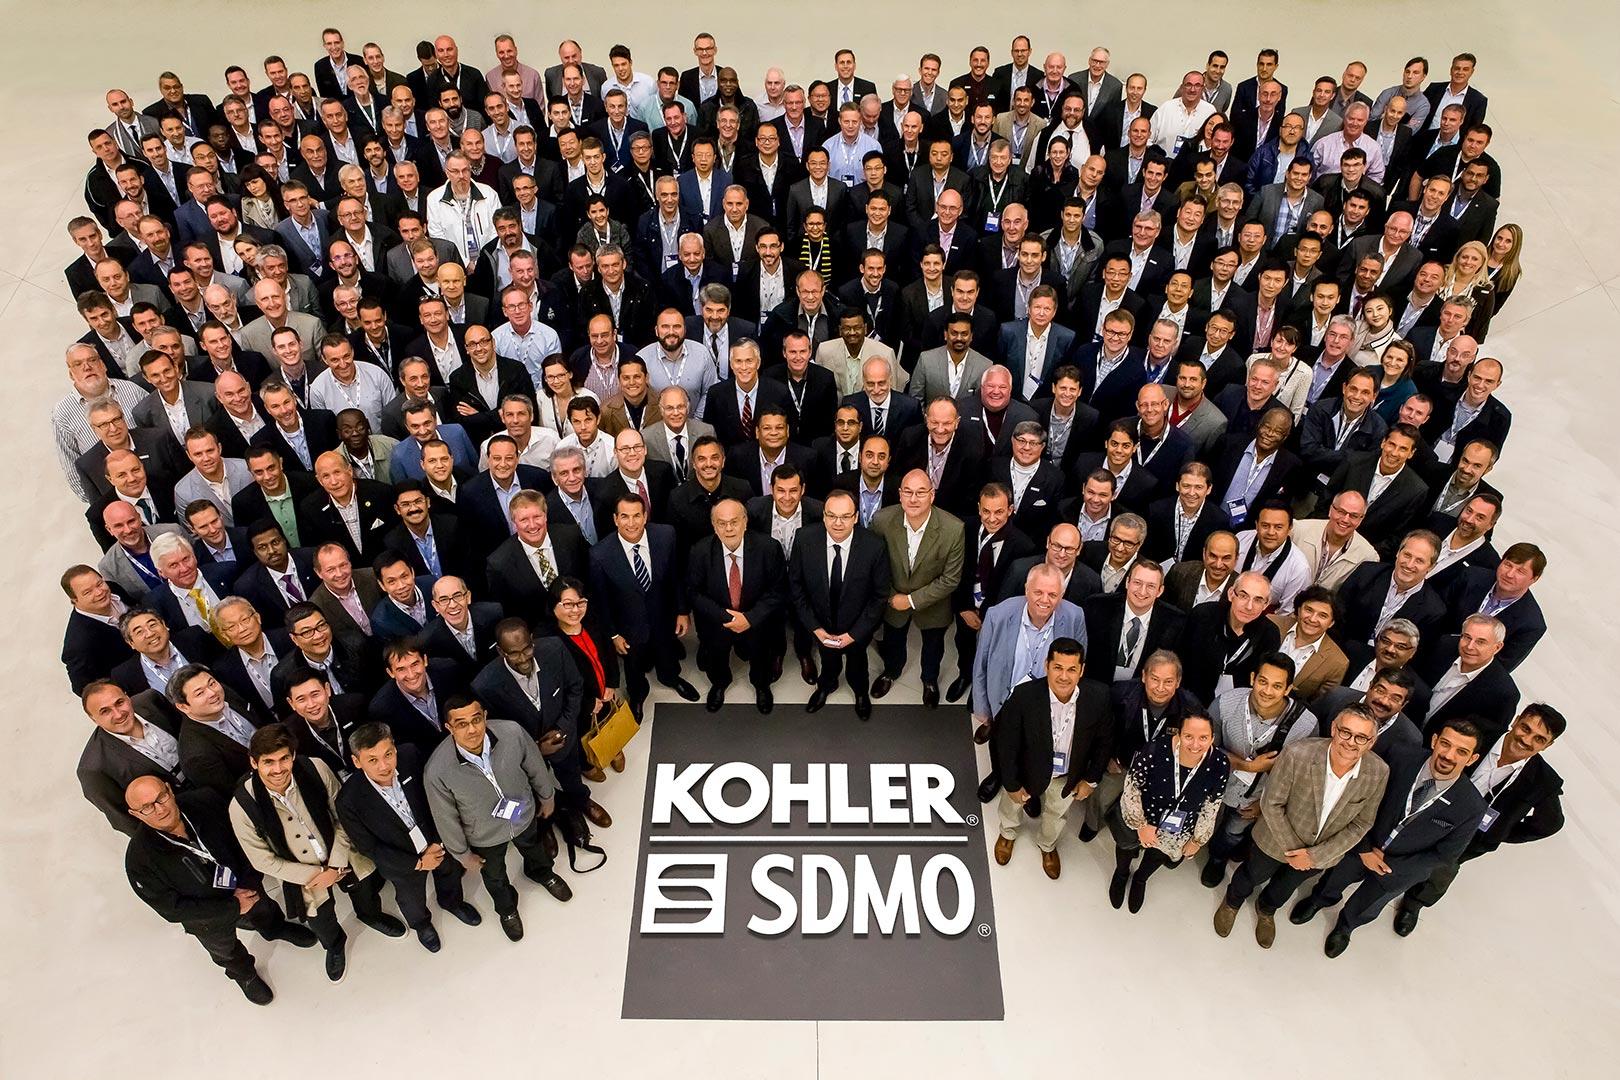 Congrès international LIEBHERR / KOHLER / SDMO - Reportage événementiel